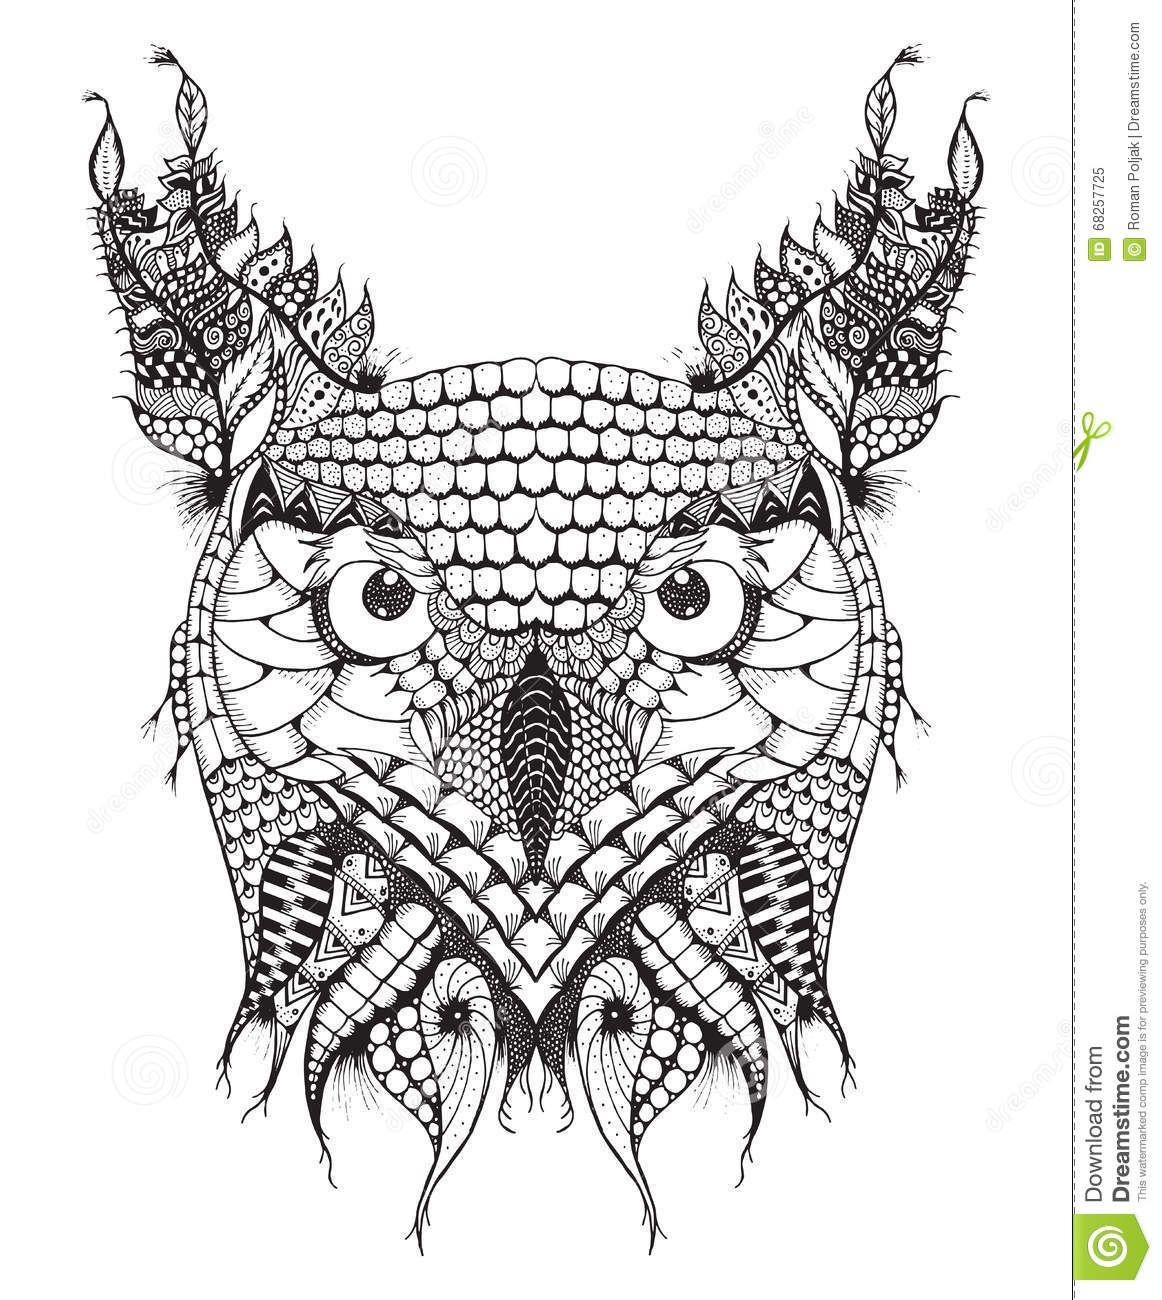 Great Horned Owl Head Zentangle Stylized Vector Illustration Freehand Pencil Hand Drawn Pattern Zen Art Ornate Lace Print 682577 Great Horned Owl Owl Zentangle